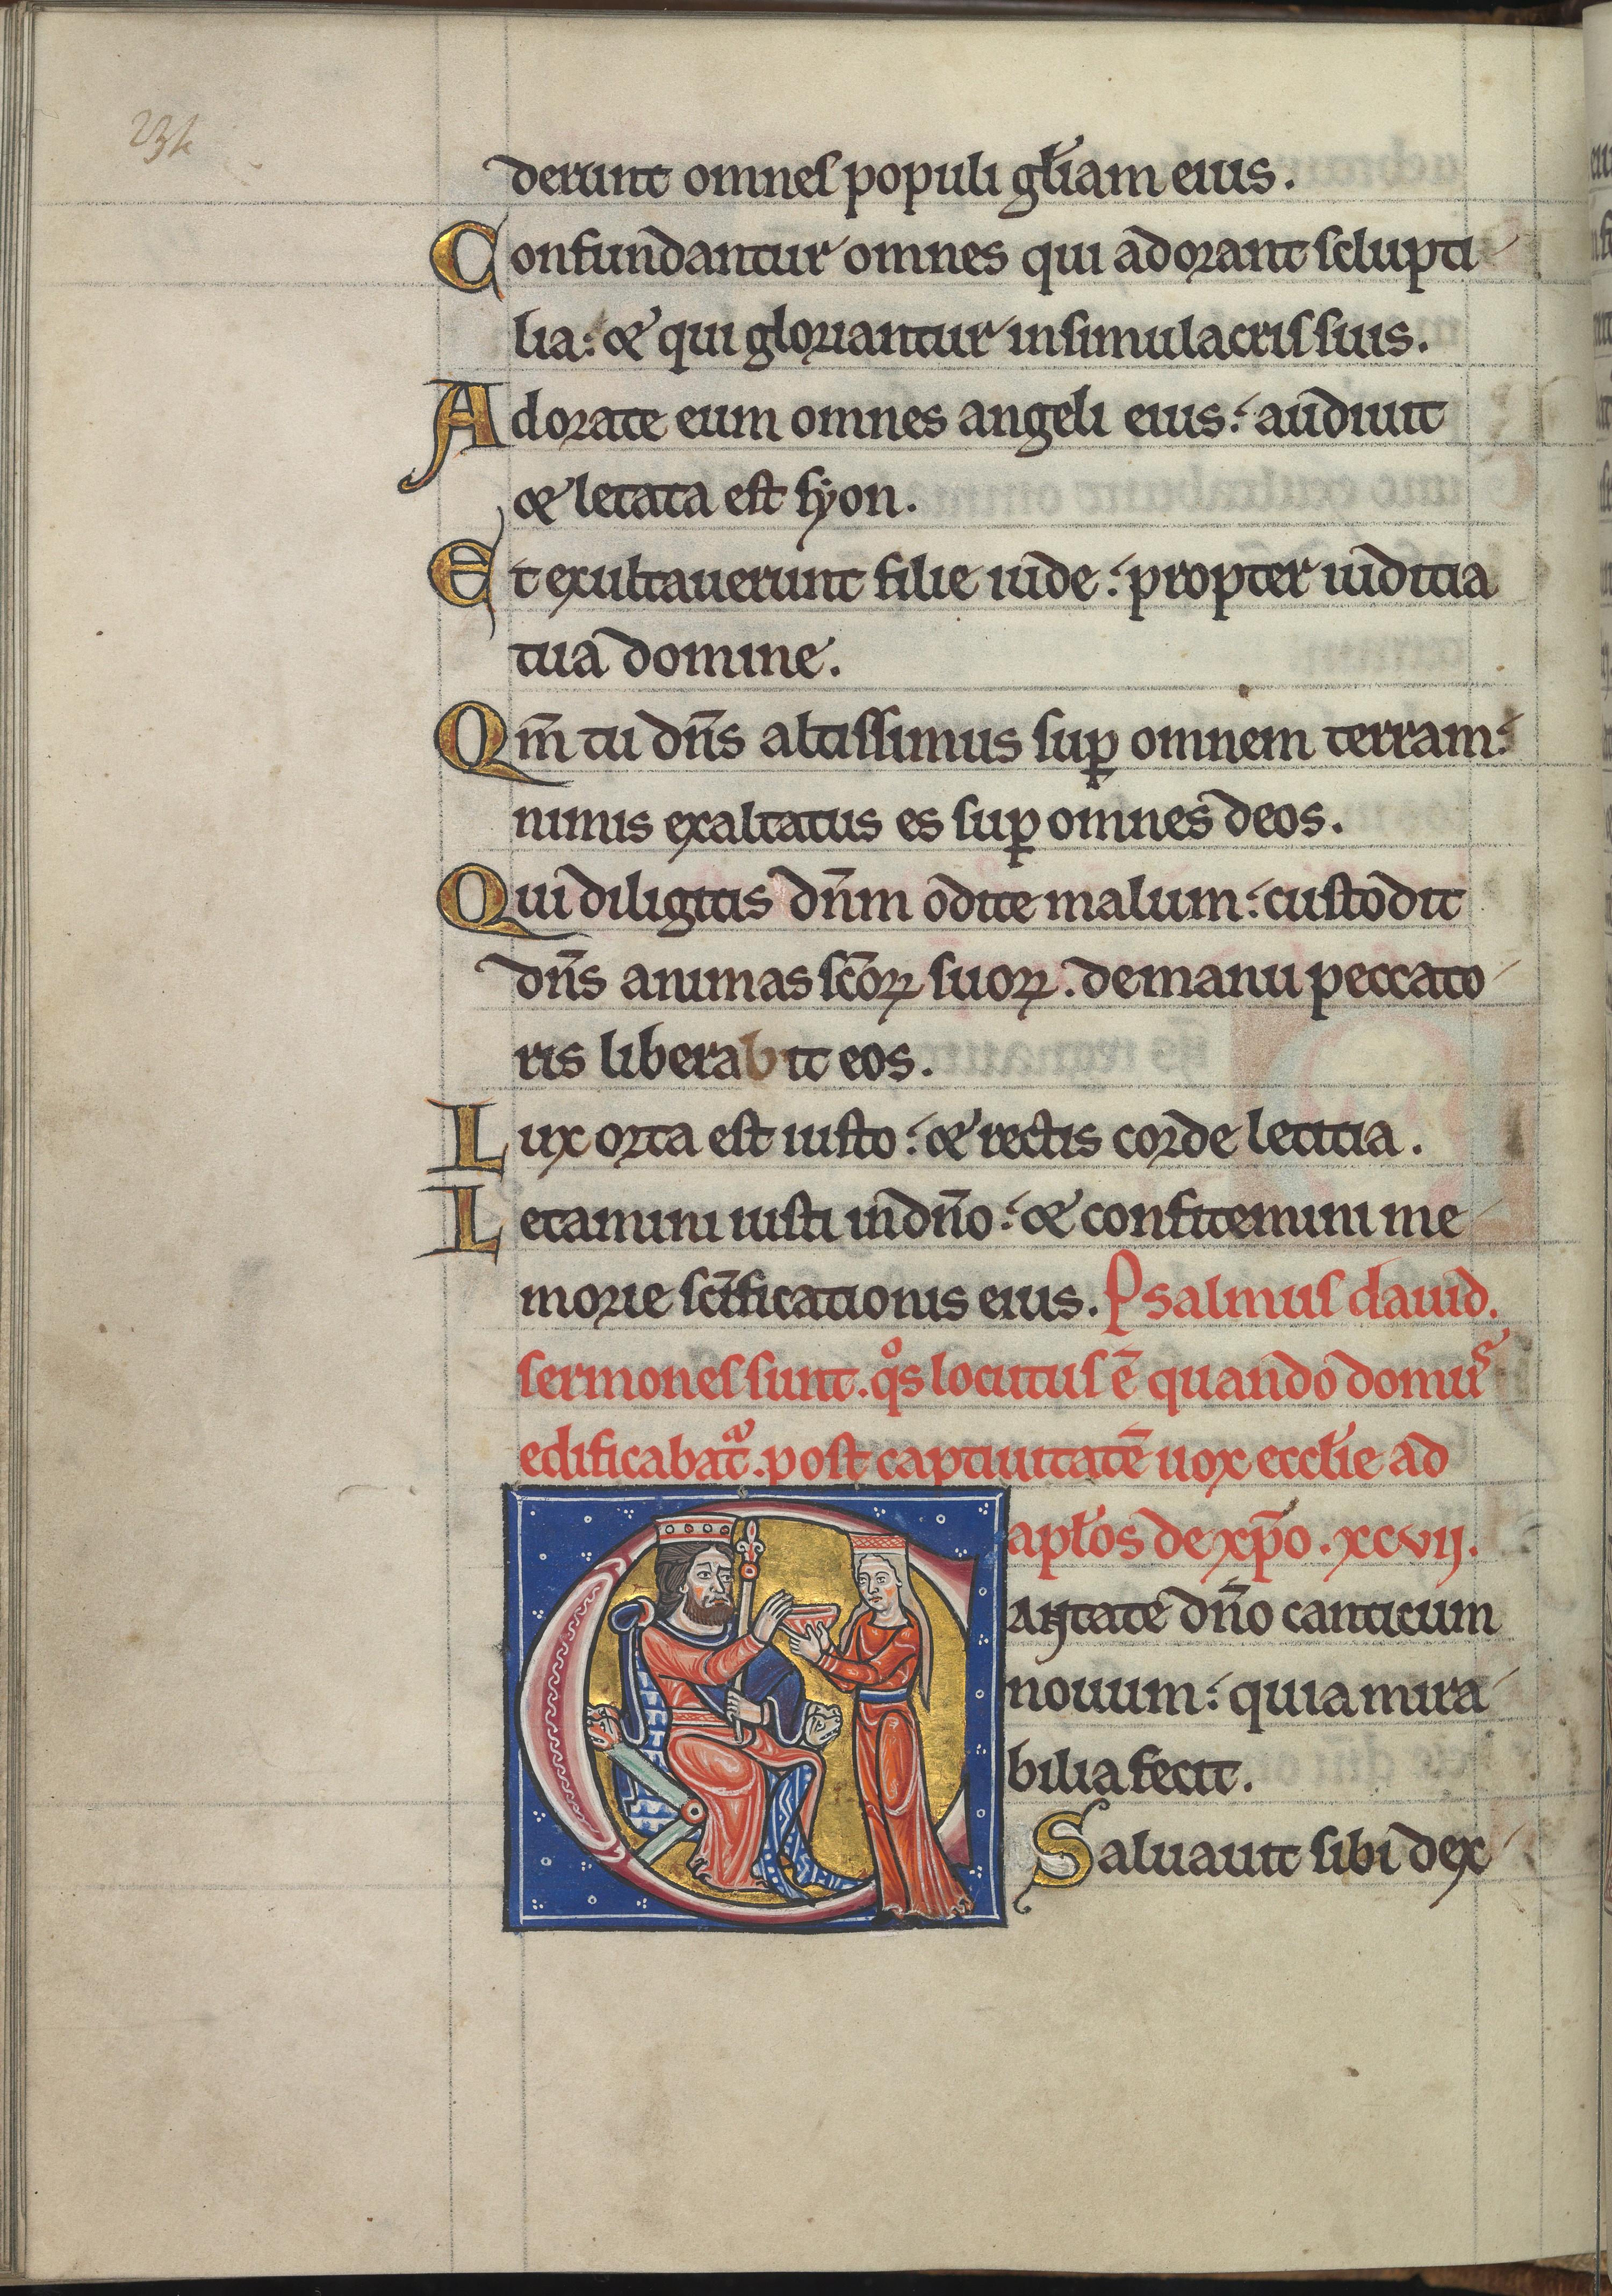 Psalm_97,_Cantate_domino_canticum_novum,_quia_mirabilia_fecit,_King_David_and_a_woman_(Ecclesia?)_offering_him_a_chalice_-_Psalter_of_Eleanor_of_Aquitaine_(ca._1185)_-_KB_76_F_13,_folium_117v